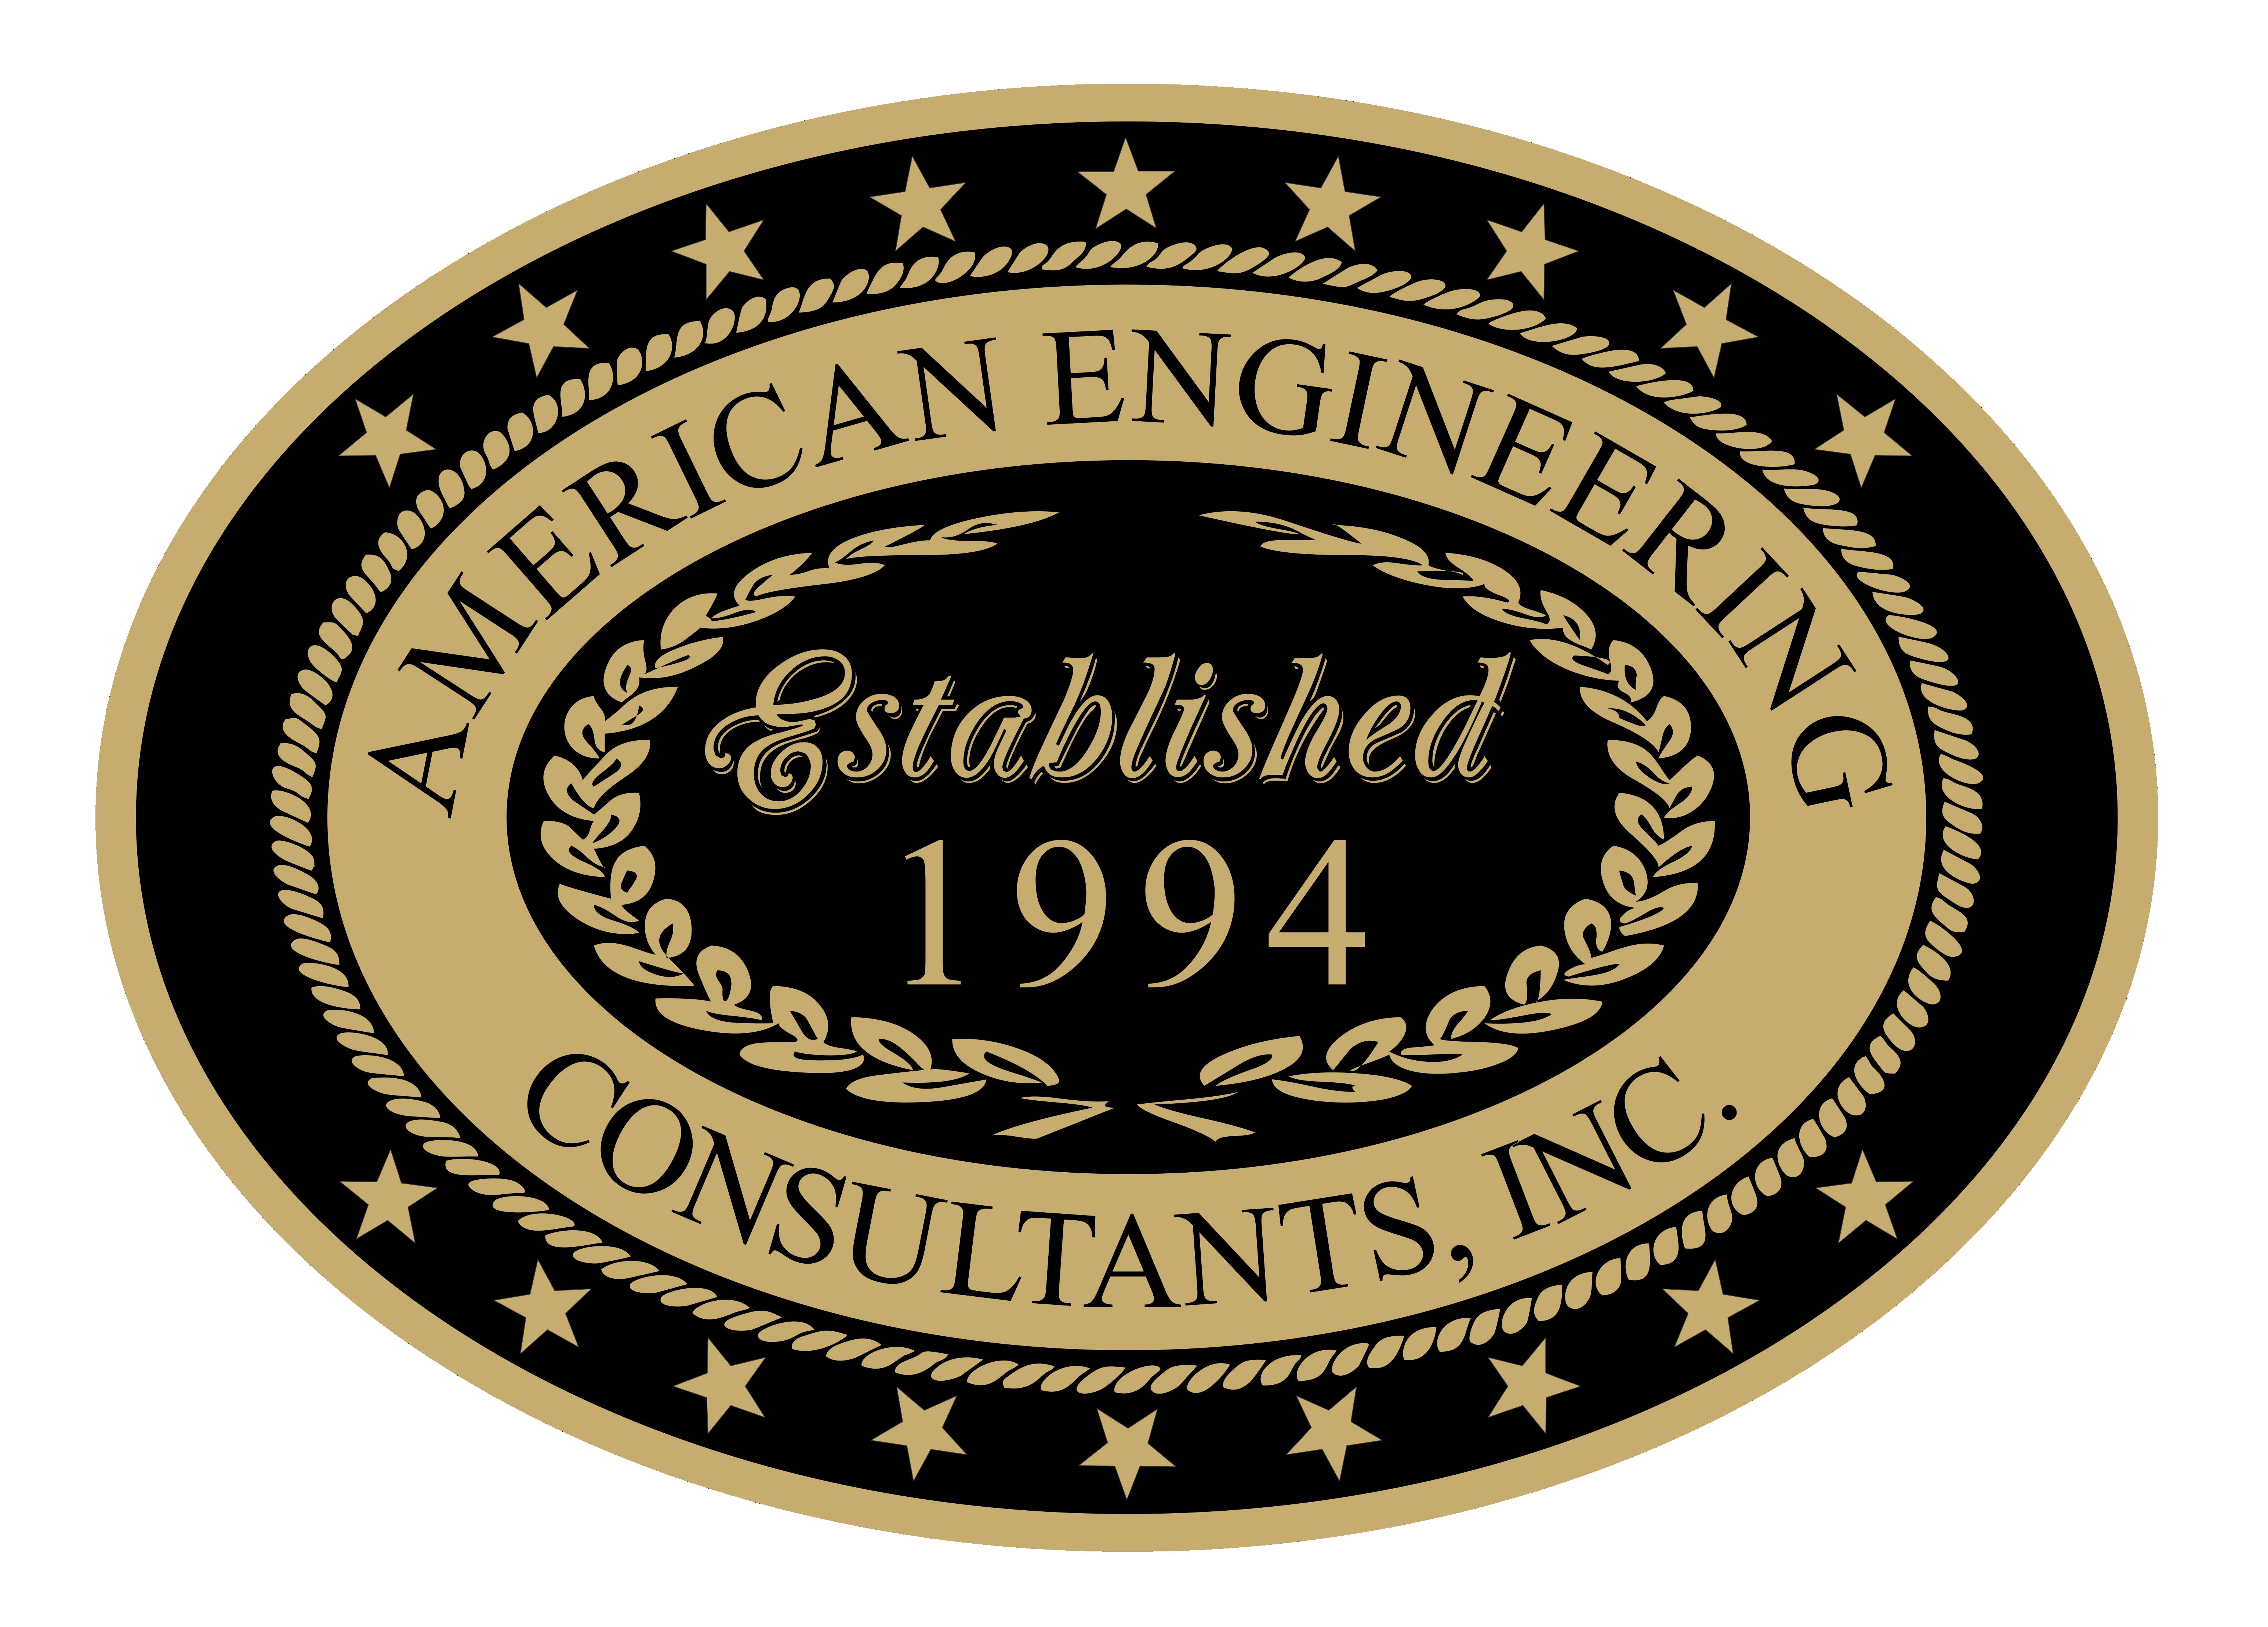 American Engineering Consultants, Inc.